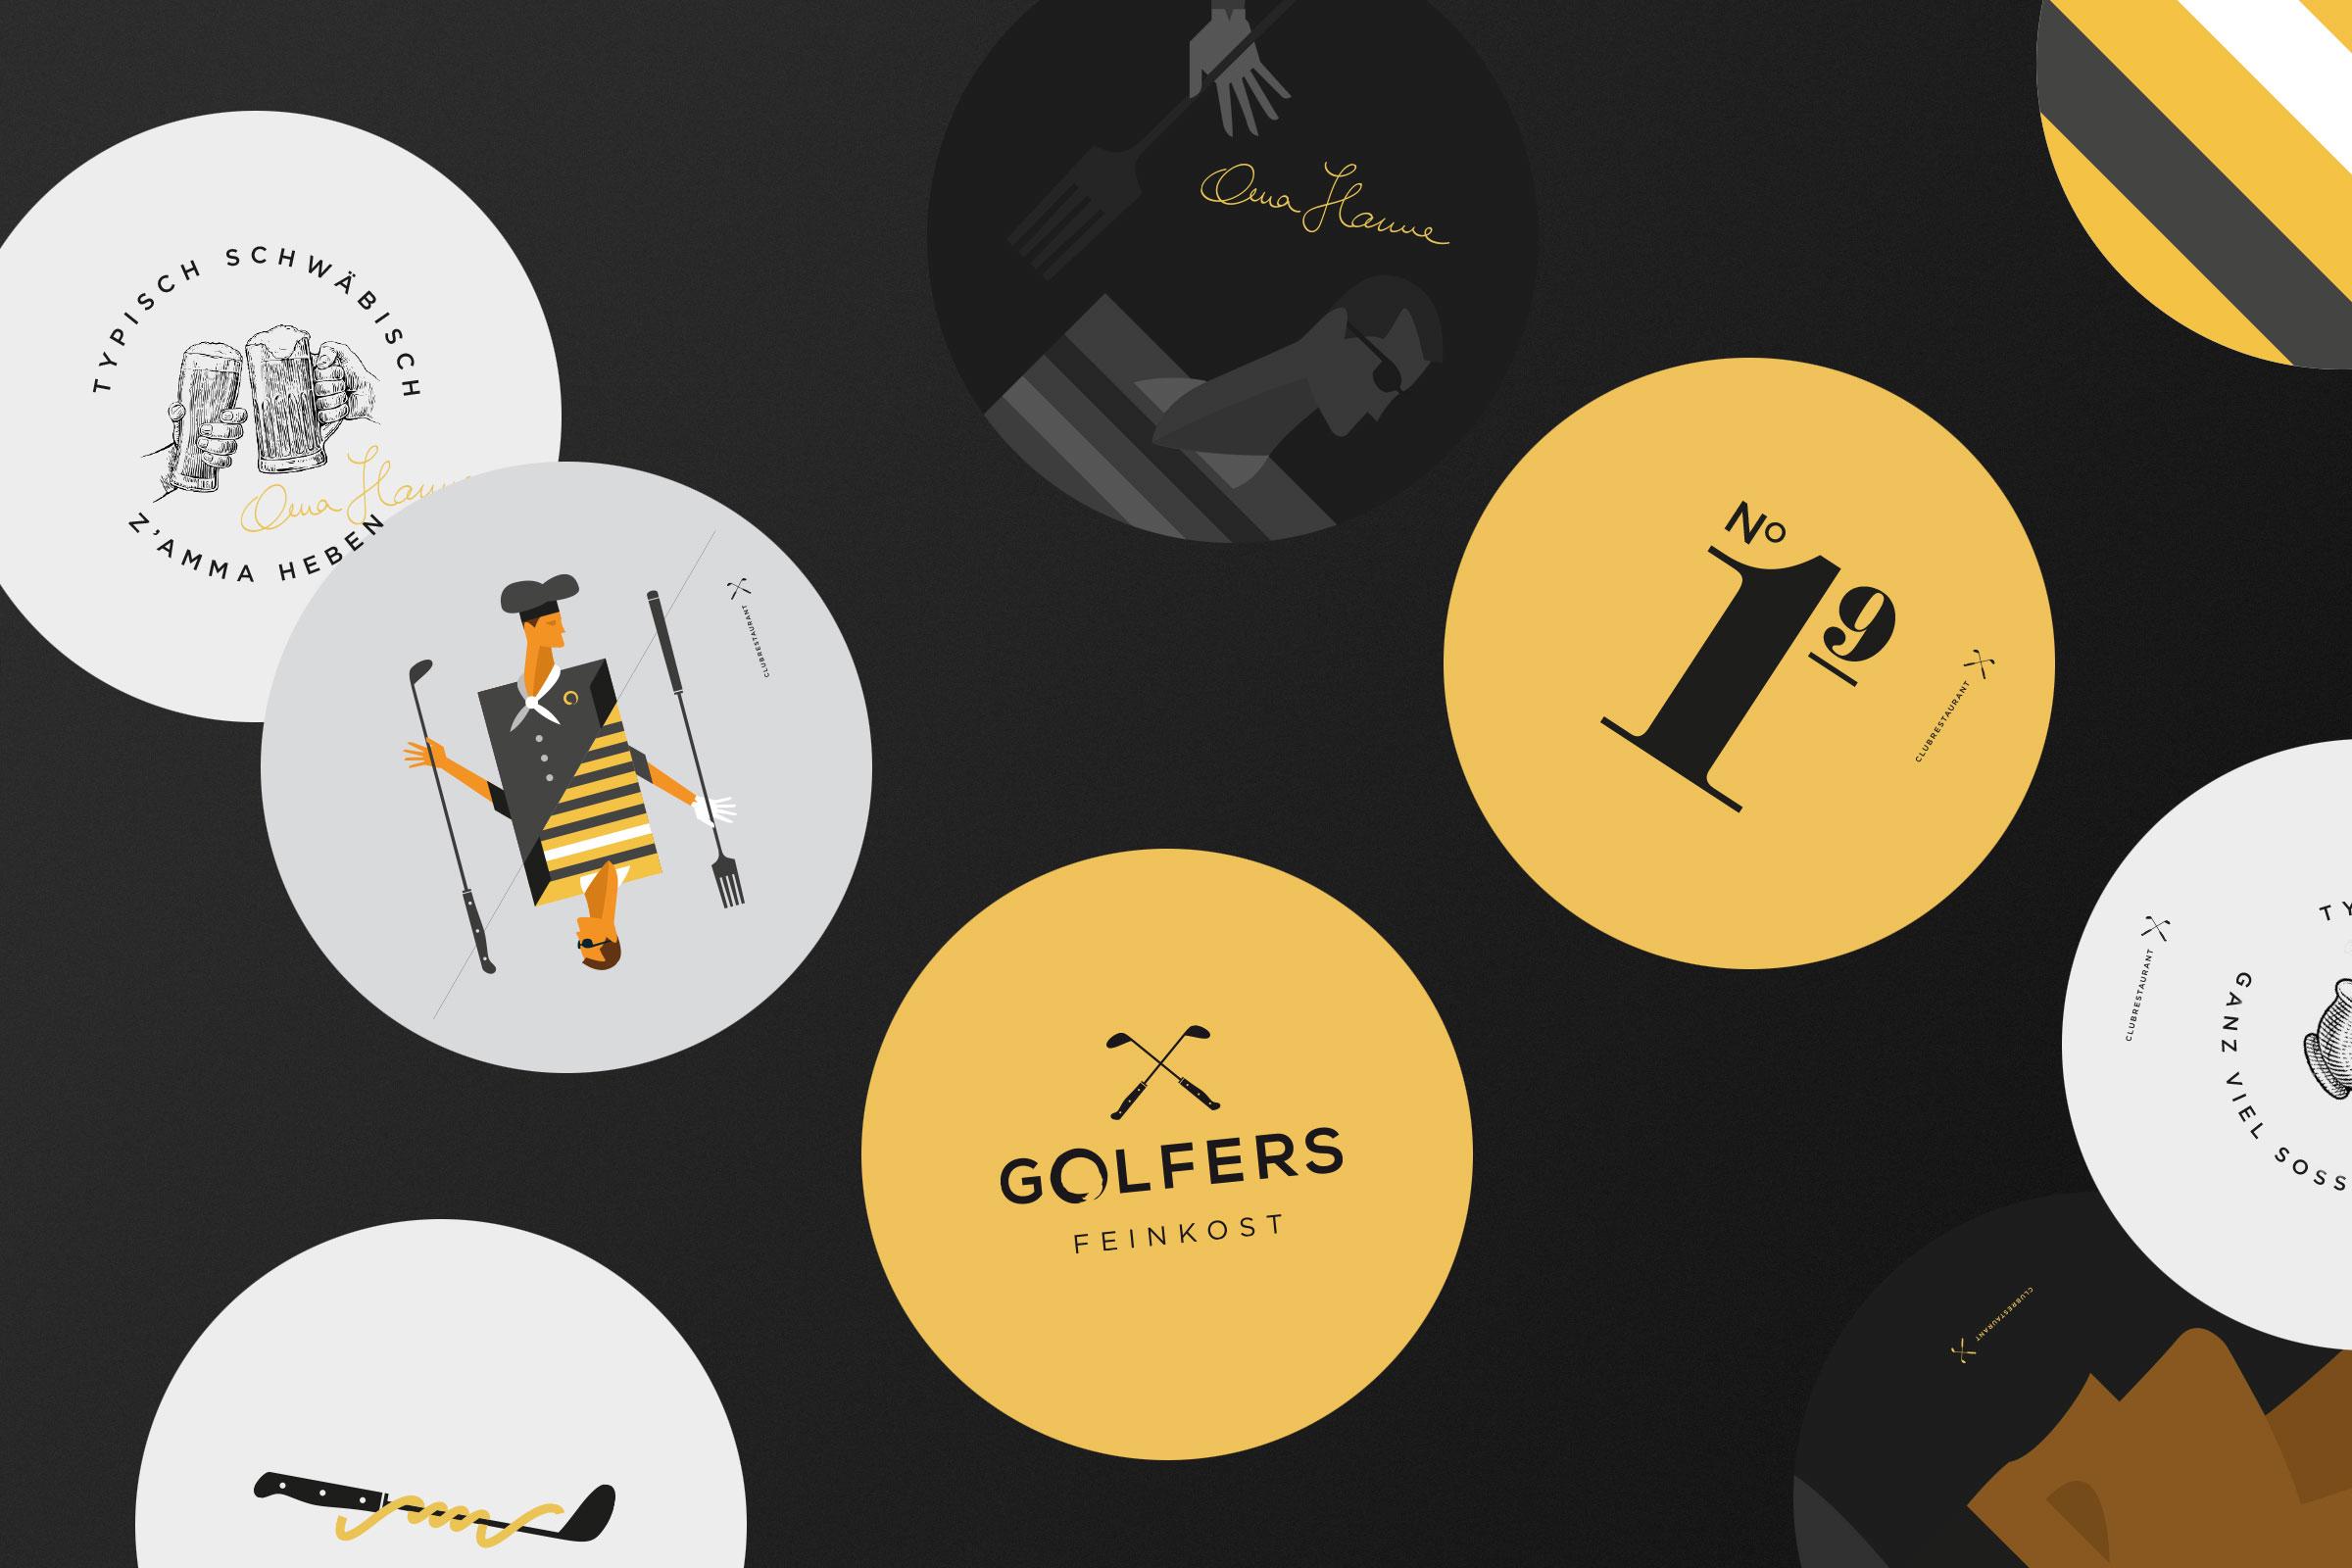 visee_case_golfers-25